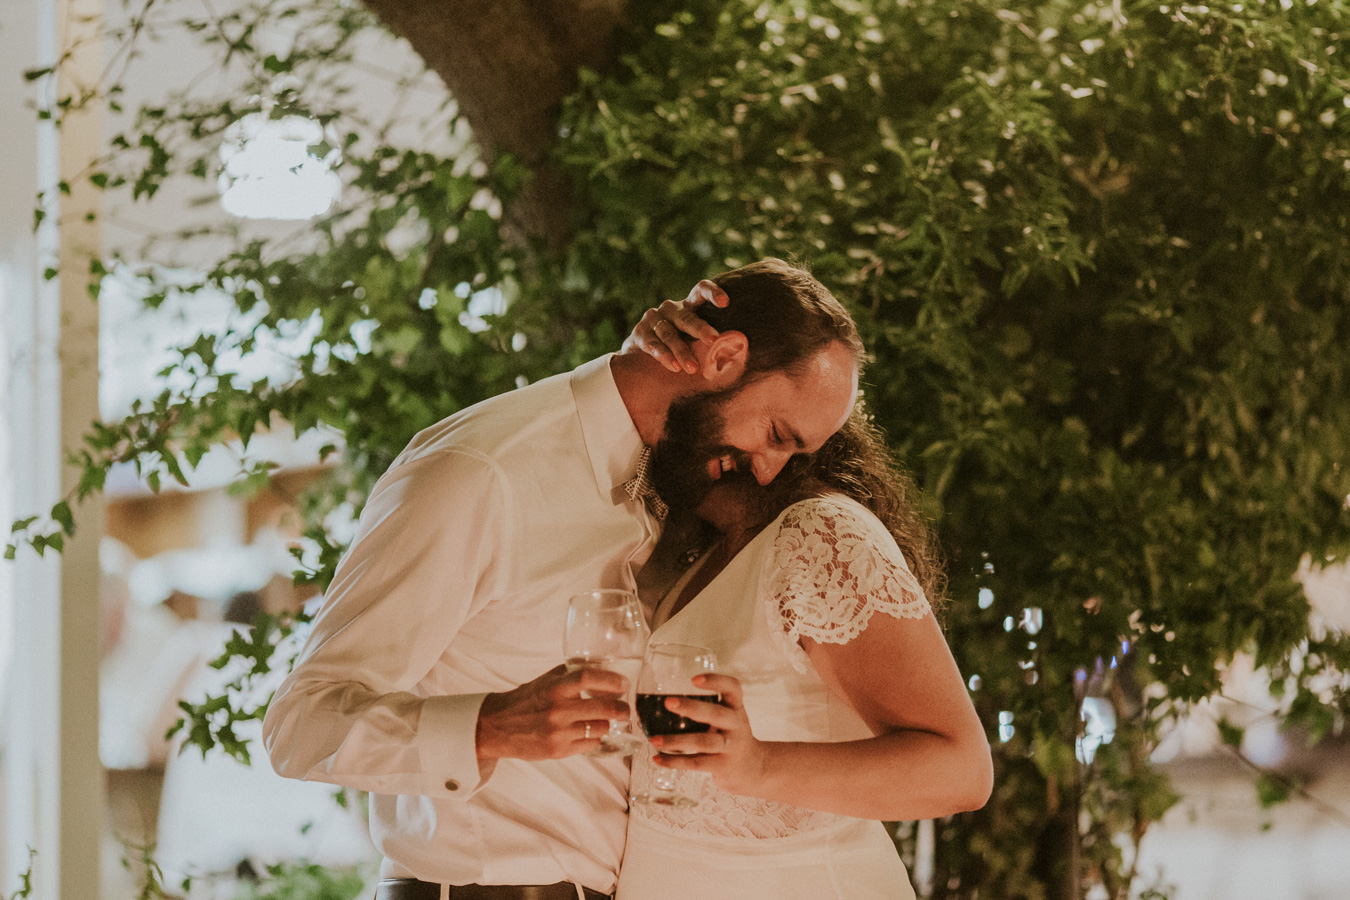 091-bryllupsfotograf-oslo-destinasjonsbryllup-fotograf-tone-tvedt.jpg